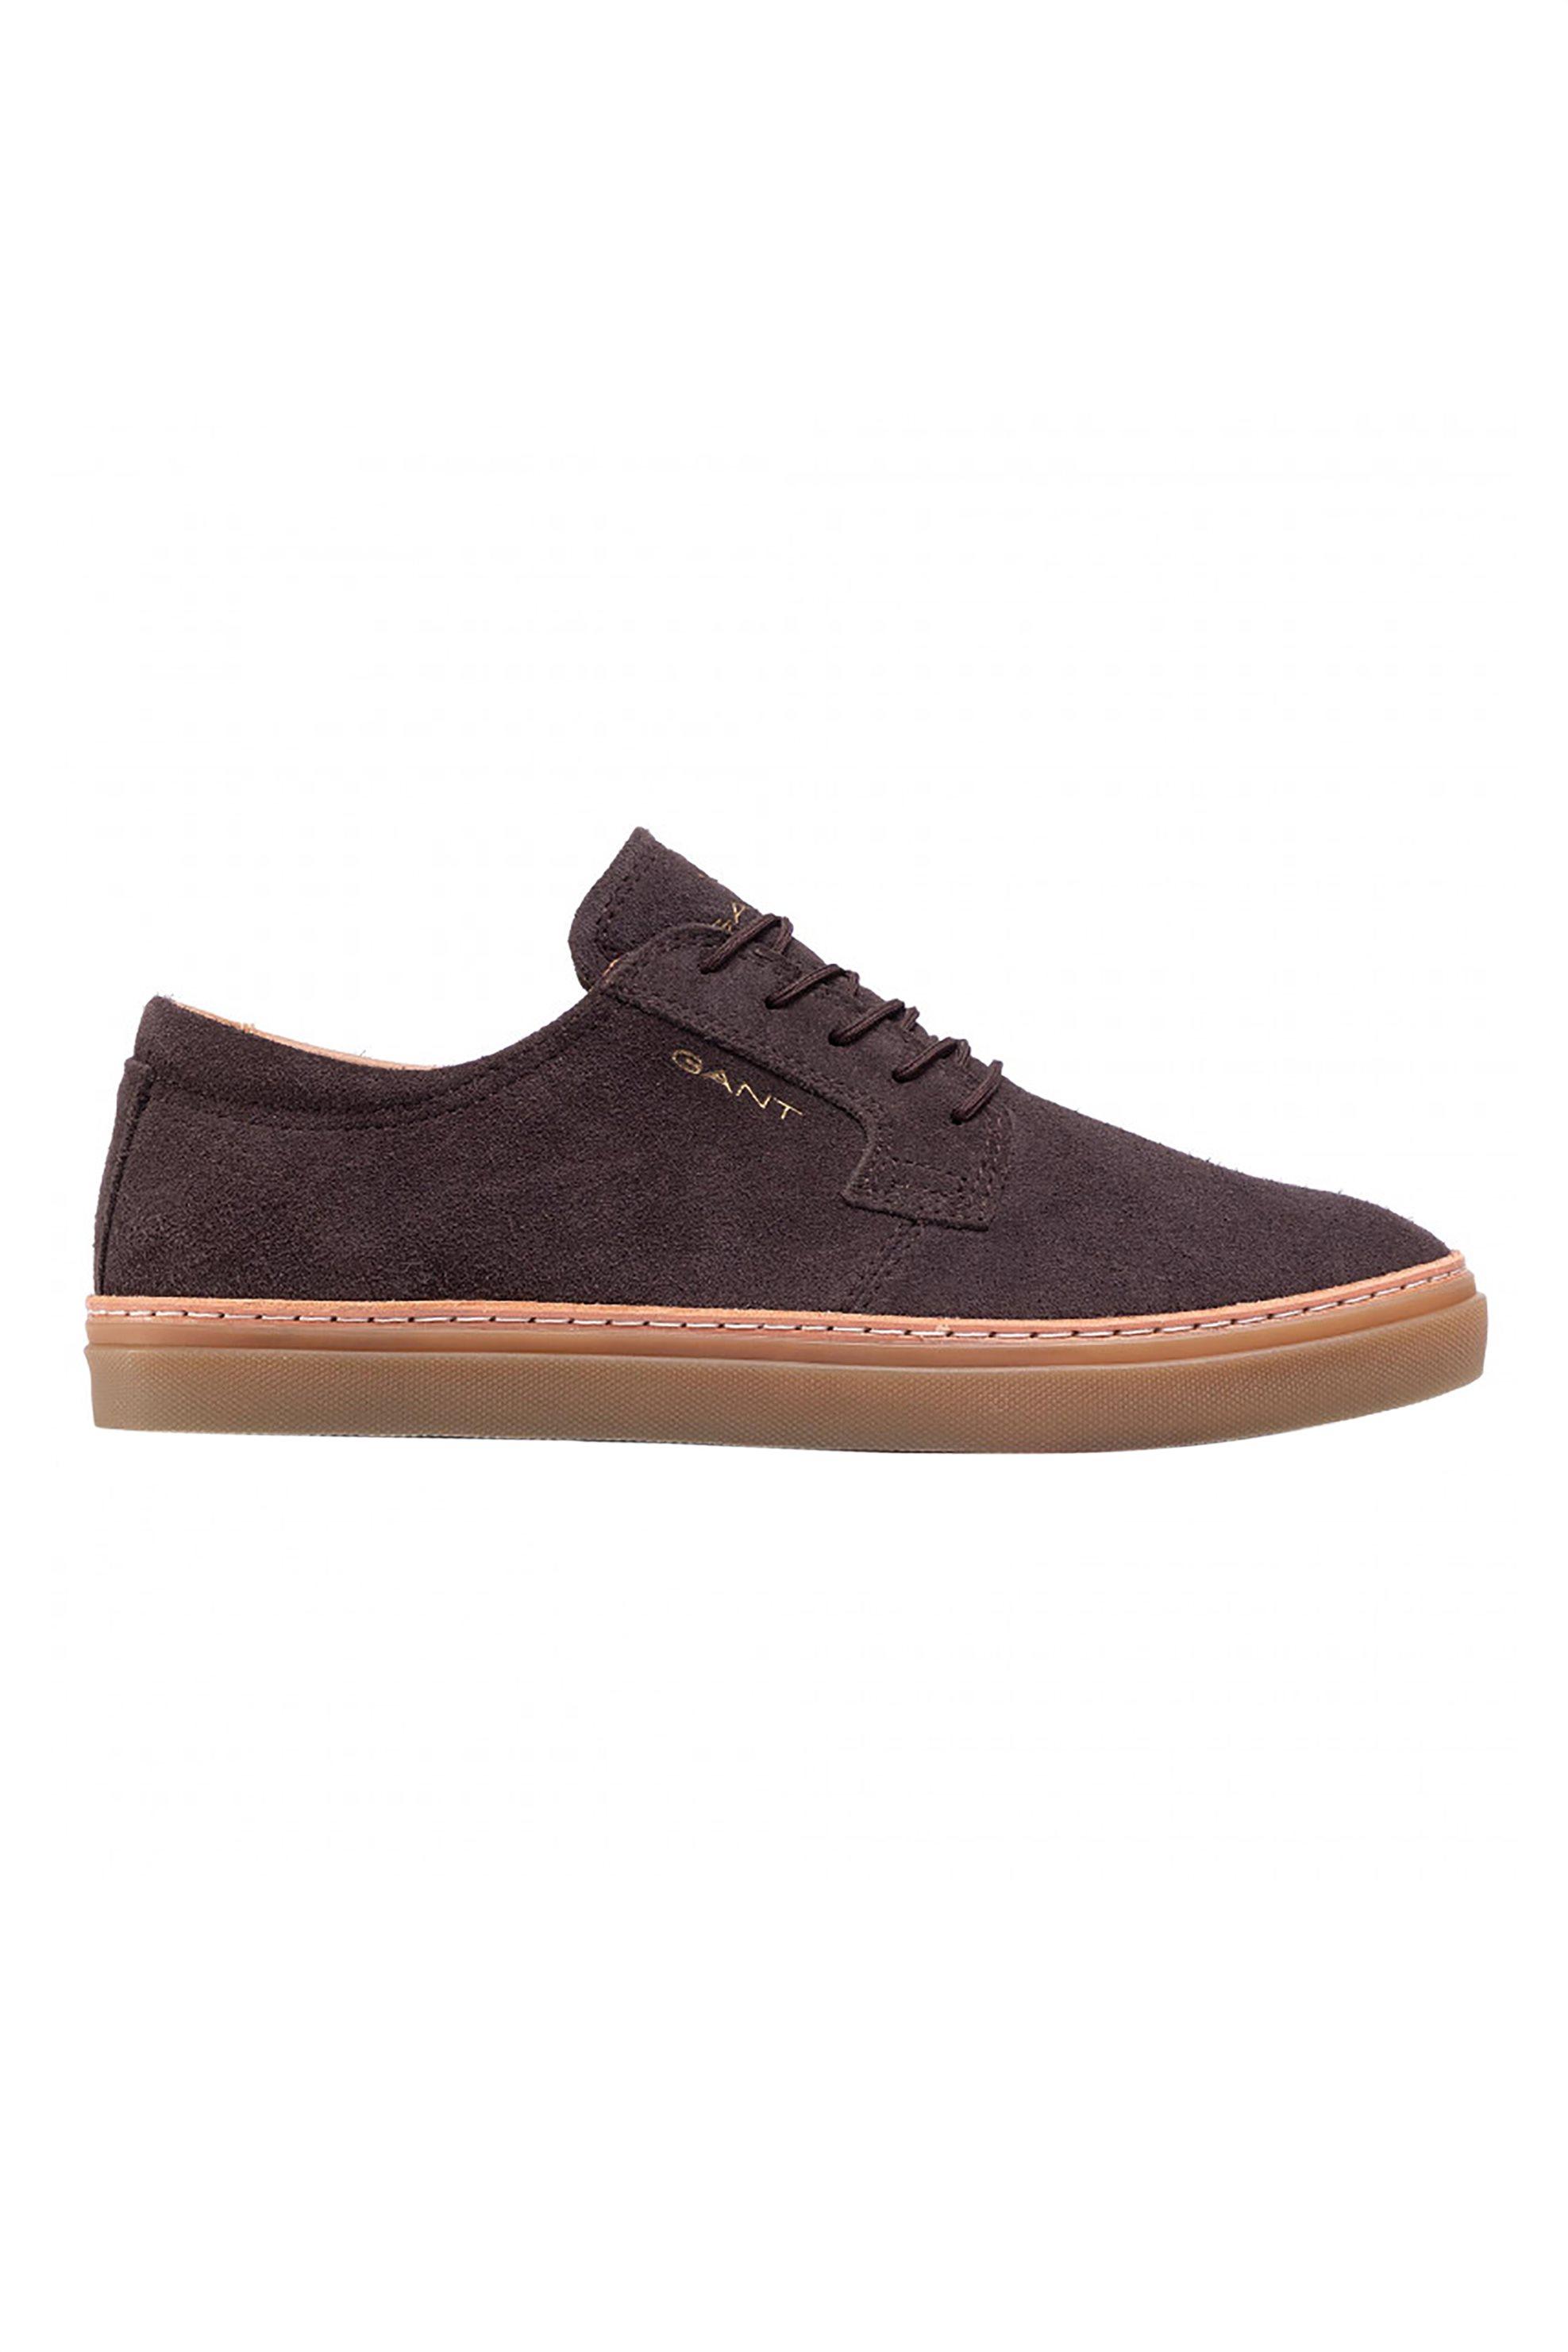 "Gant ανδρικά suede sneakers με κορδόνια ""Prepville"" – 21633875 – Καφέ"